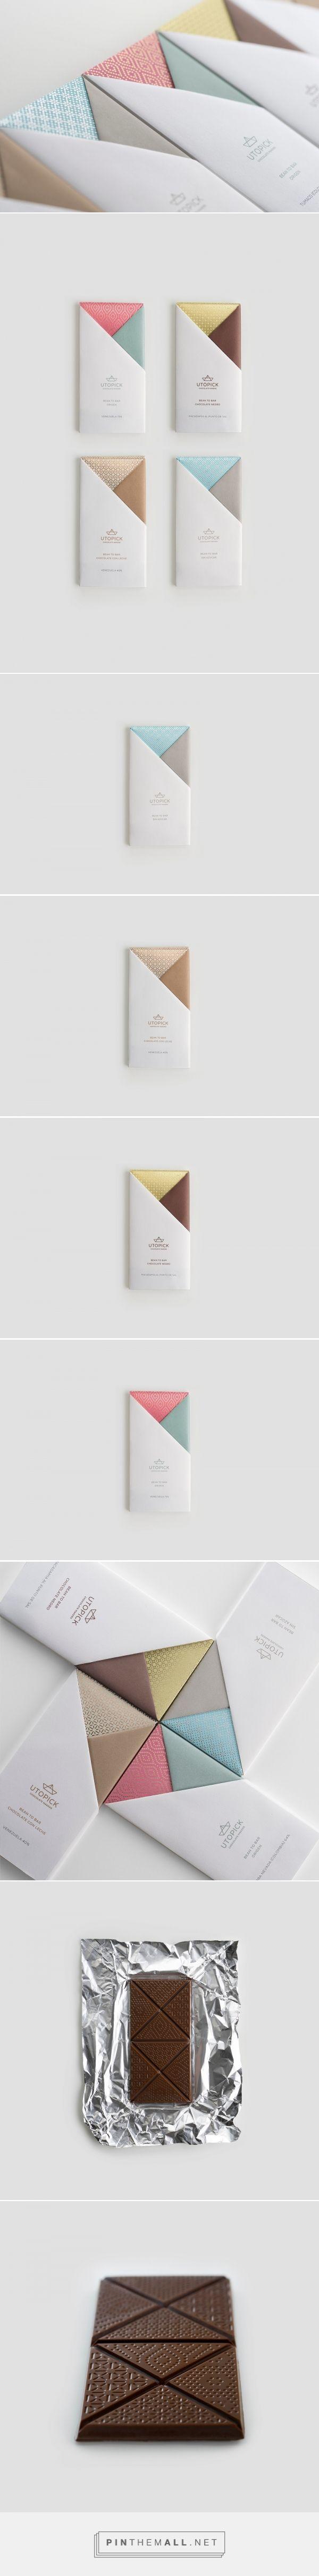 Utopick Chocolates packaging design by Lavernia & Cienfuegos - http://www.packagingoftheworld.com/2017/04/utopick-chocolates.html